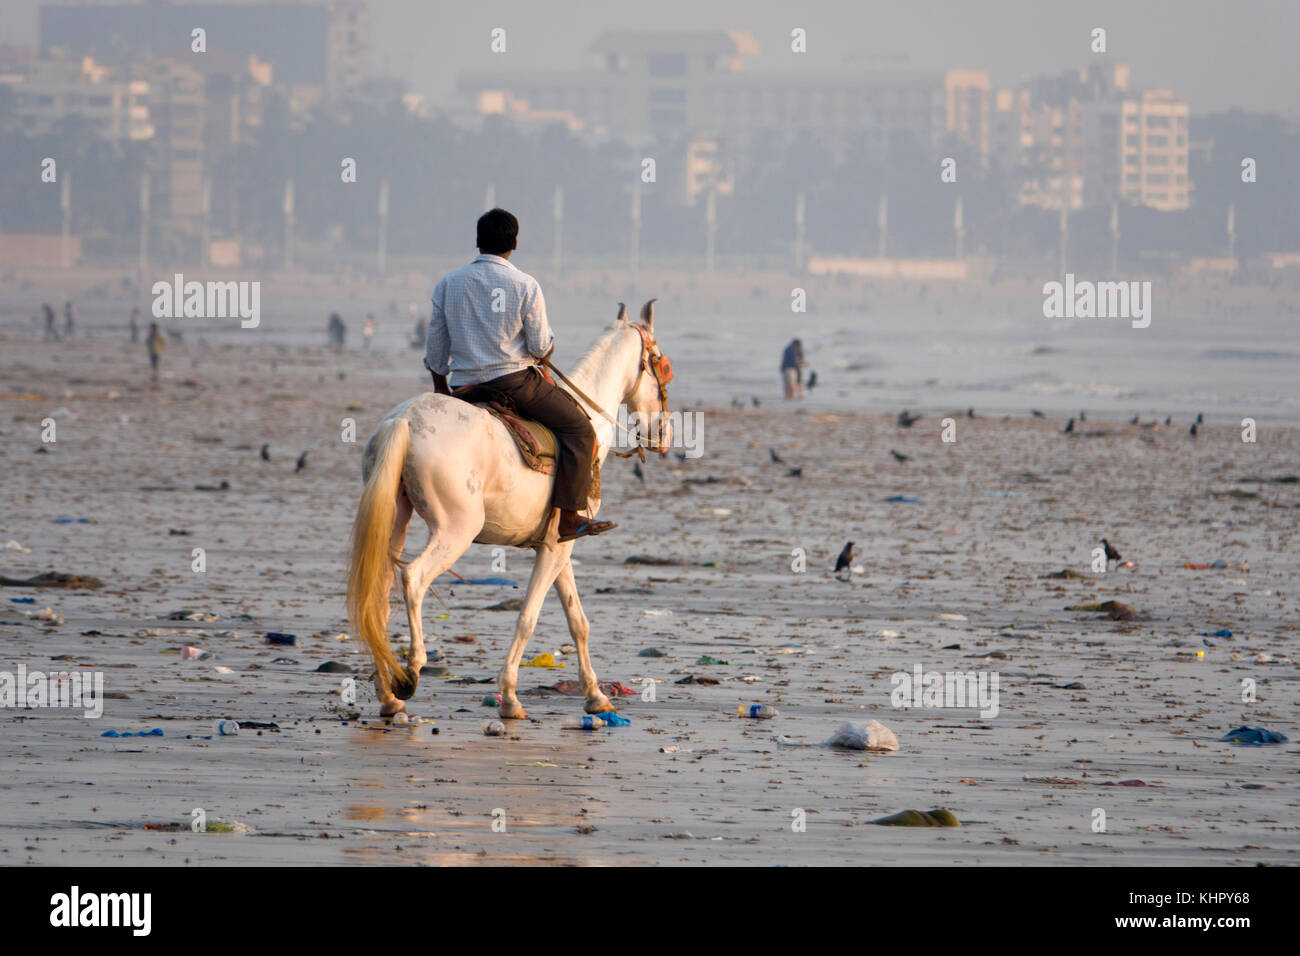 Man rides horse along polluted Juhu Beach, Mumbai Stock Photo